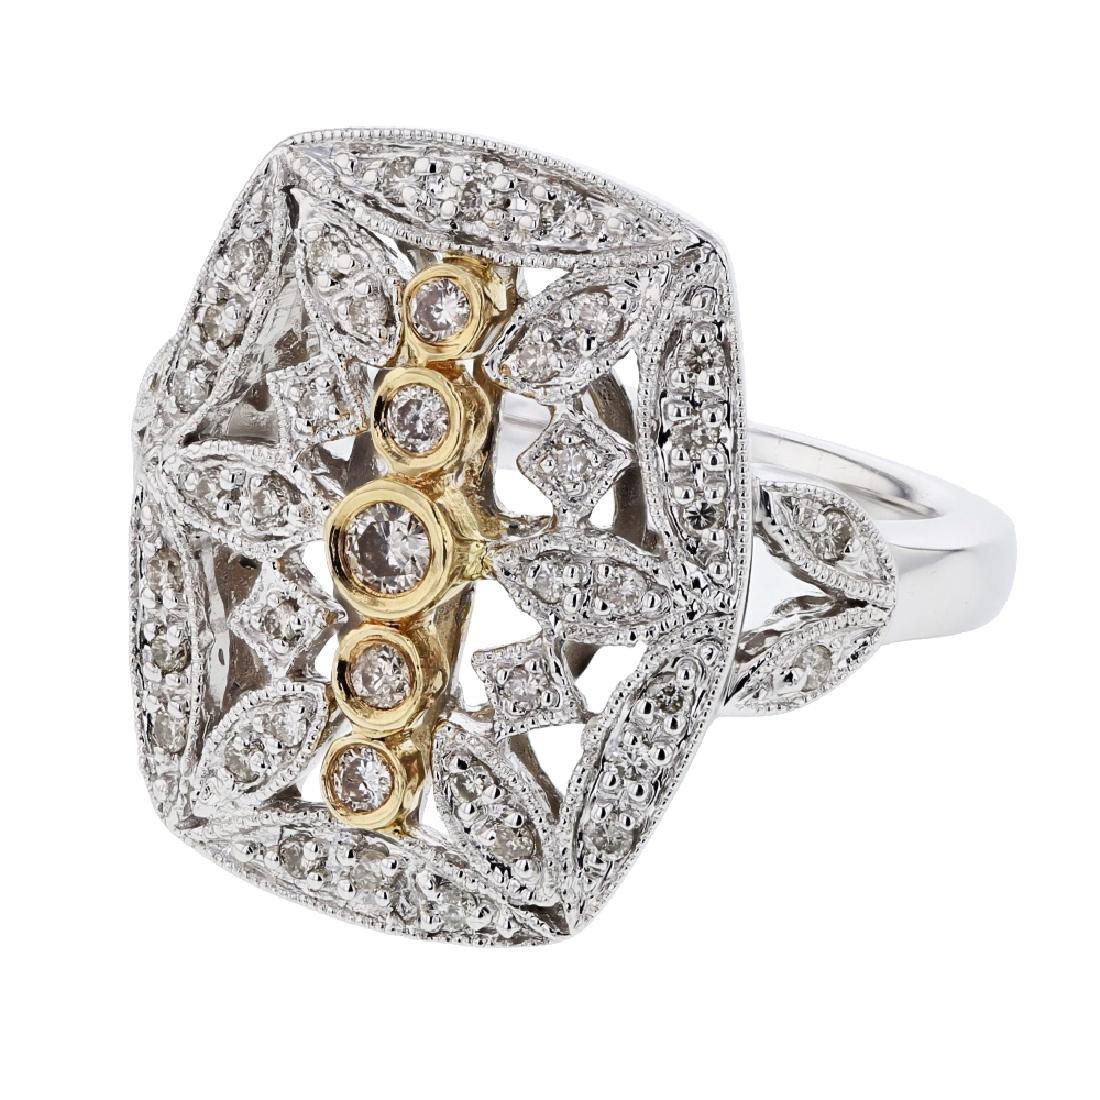 0.4 CTW 14K Two Tone Gold Ladies Ring